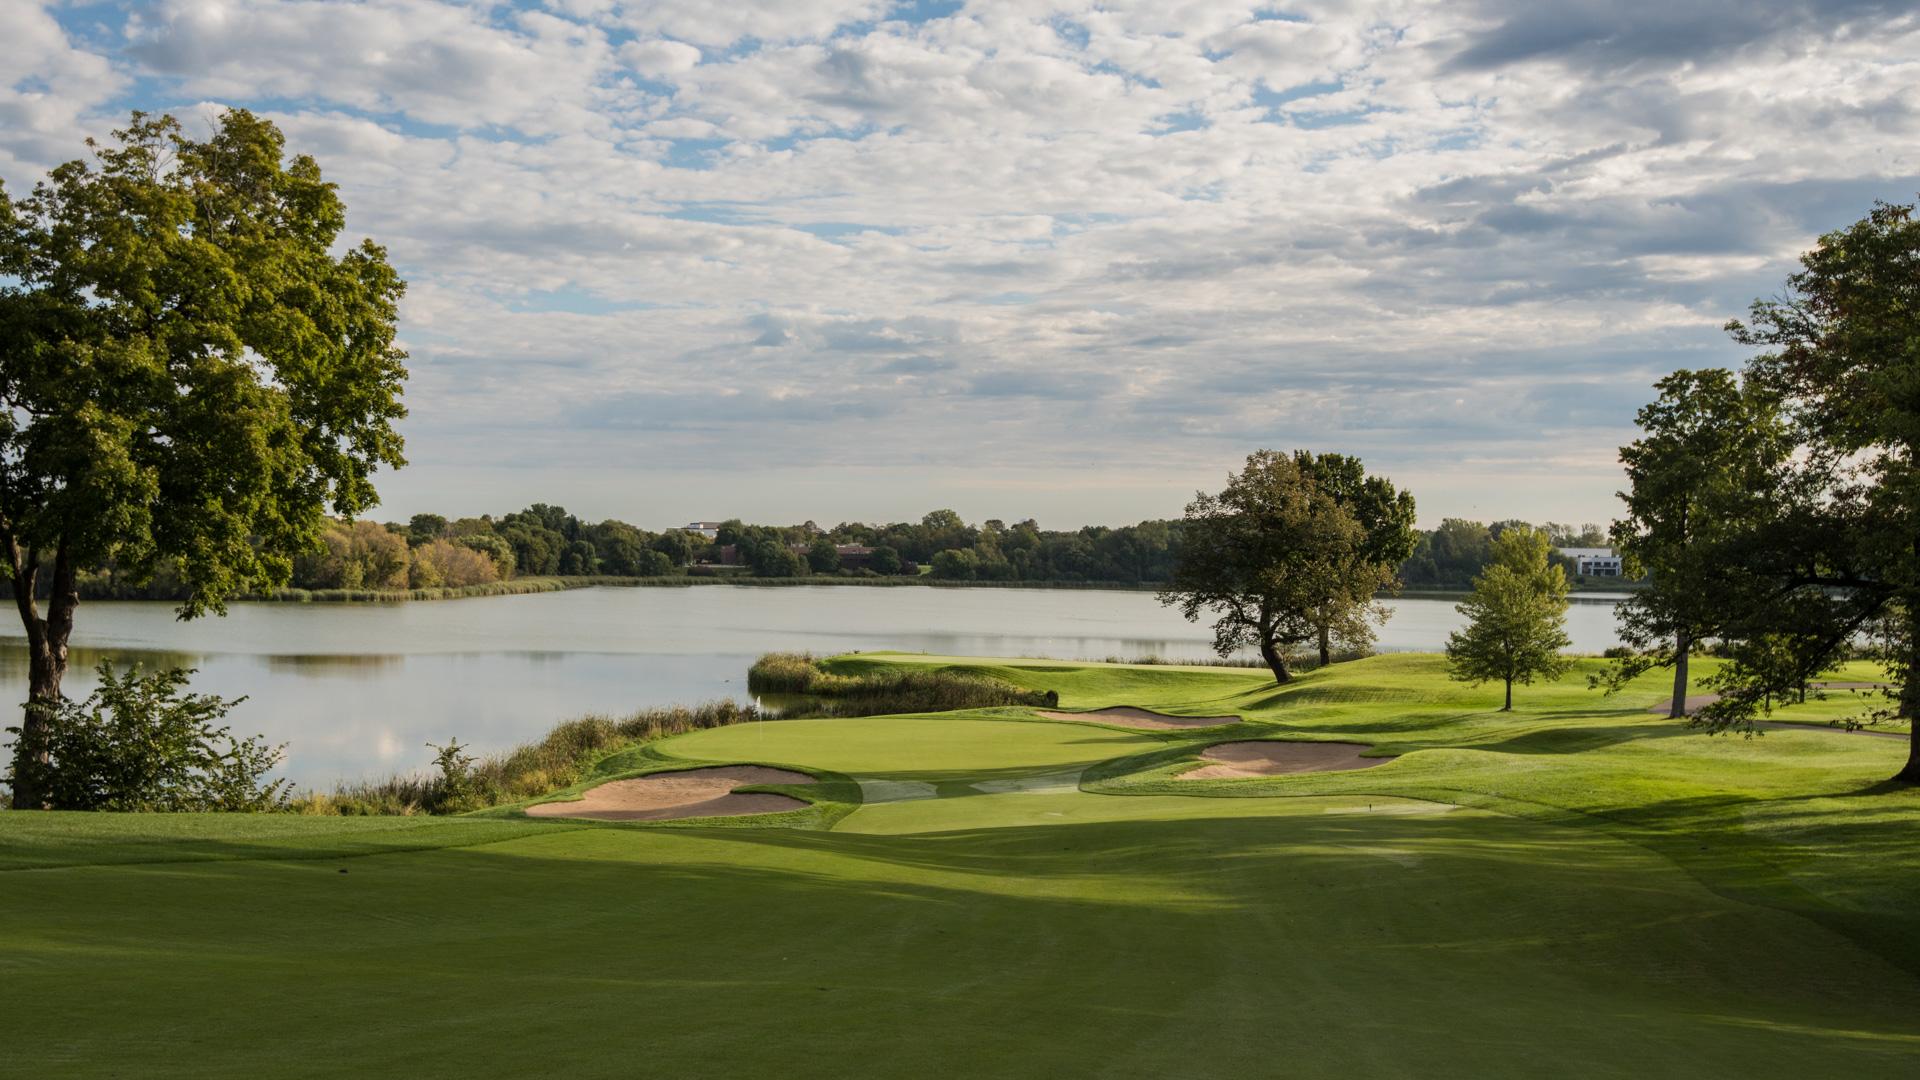 Golf i USA, här Hazeltine National Golf Club i Minnesota.